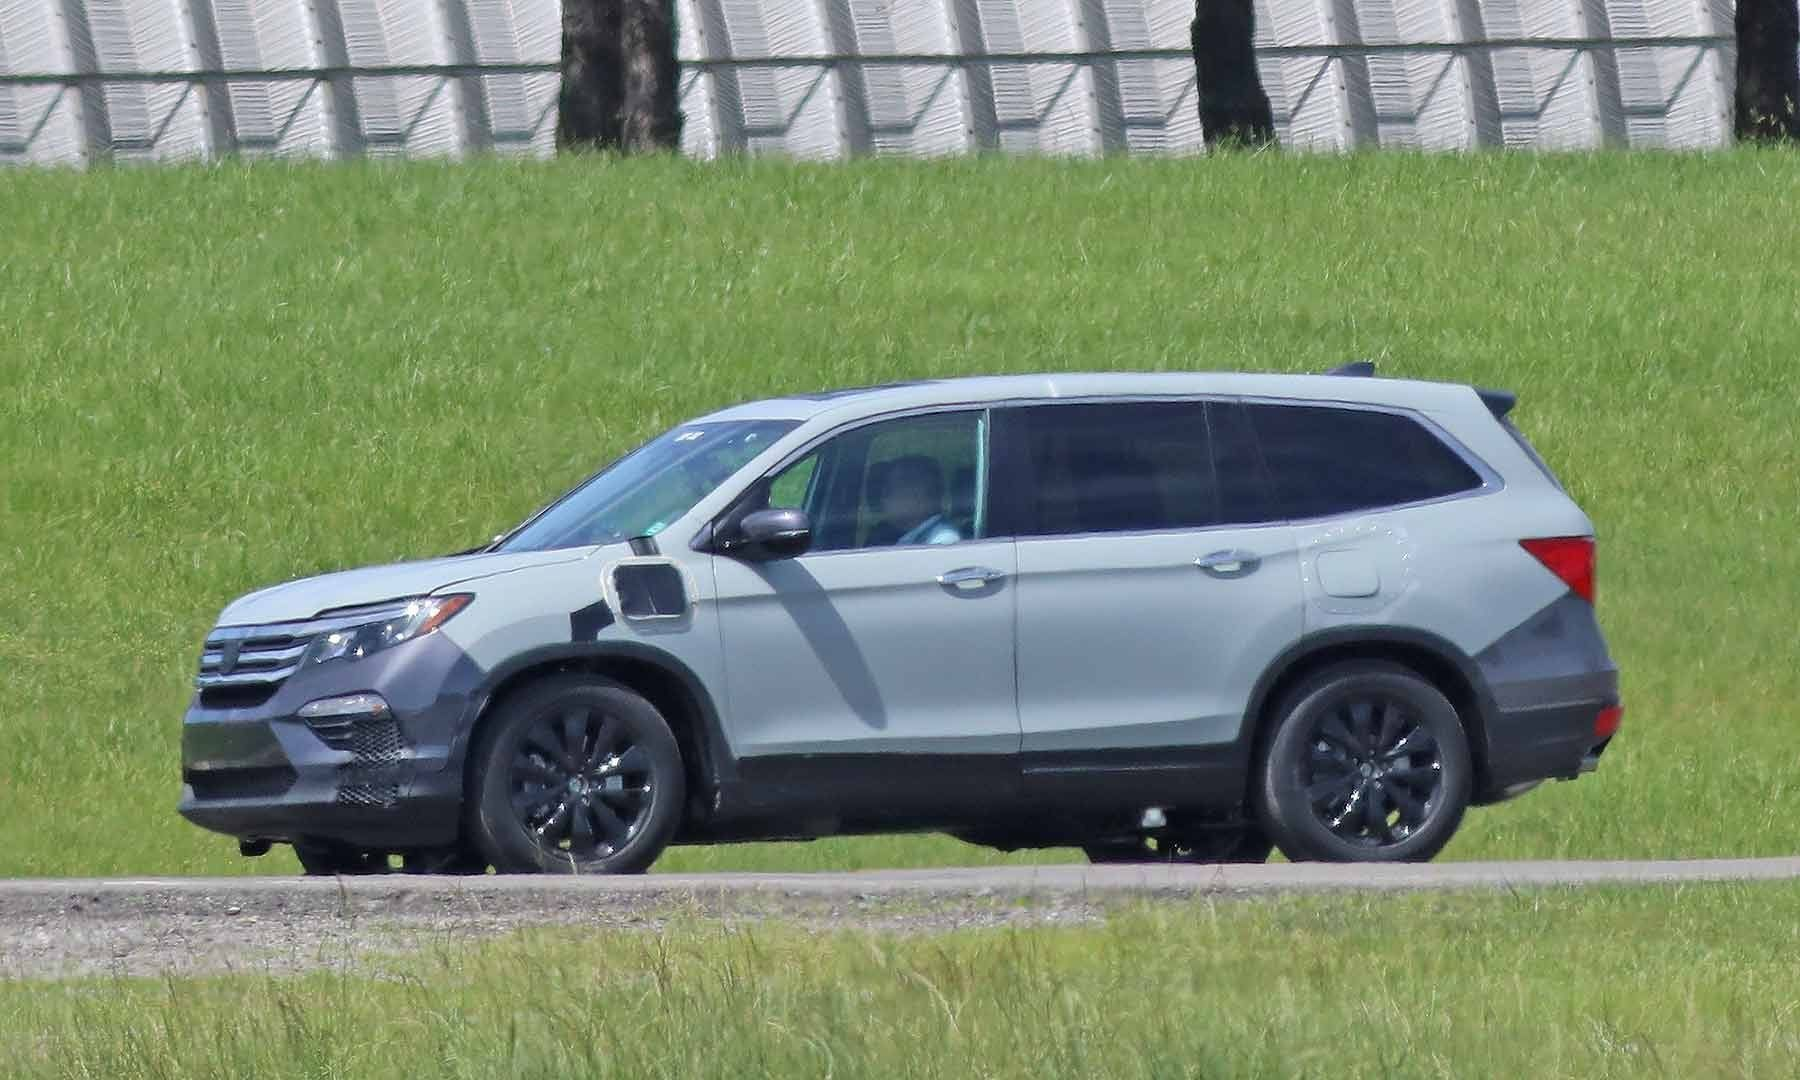 2021 Honda Pilot Spy Price, Design and Review in 2020